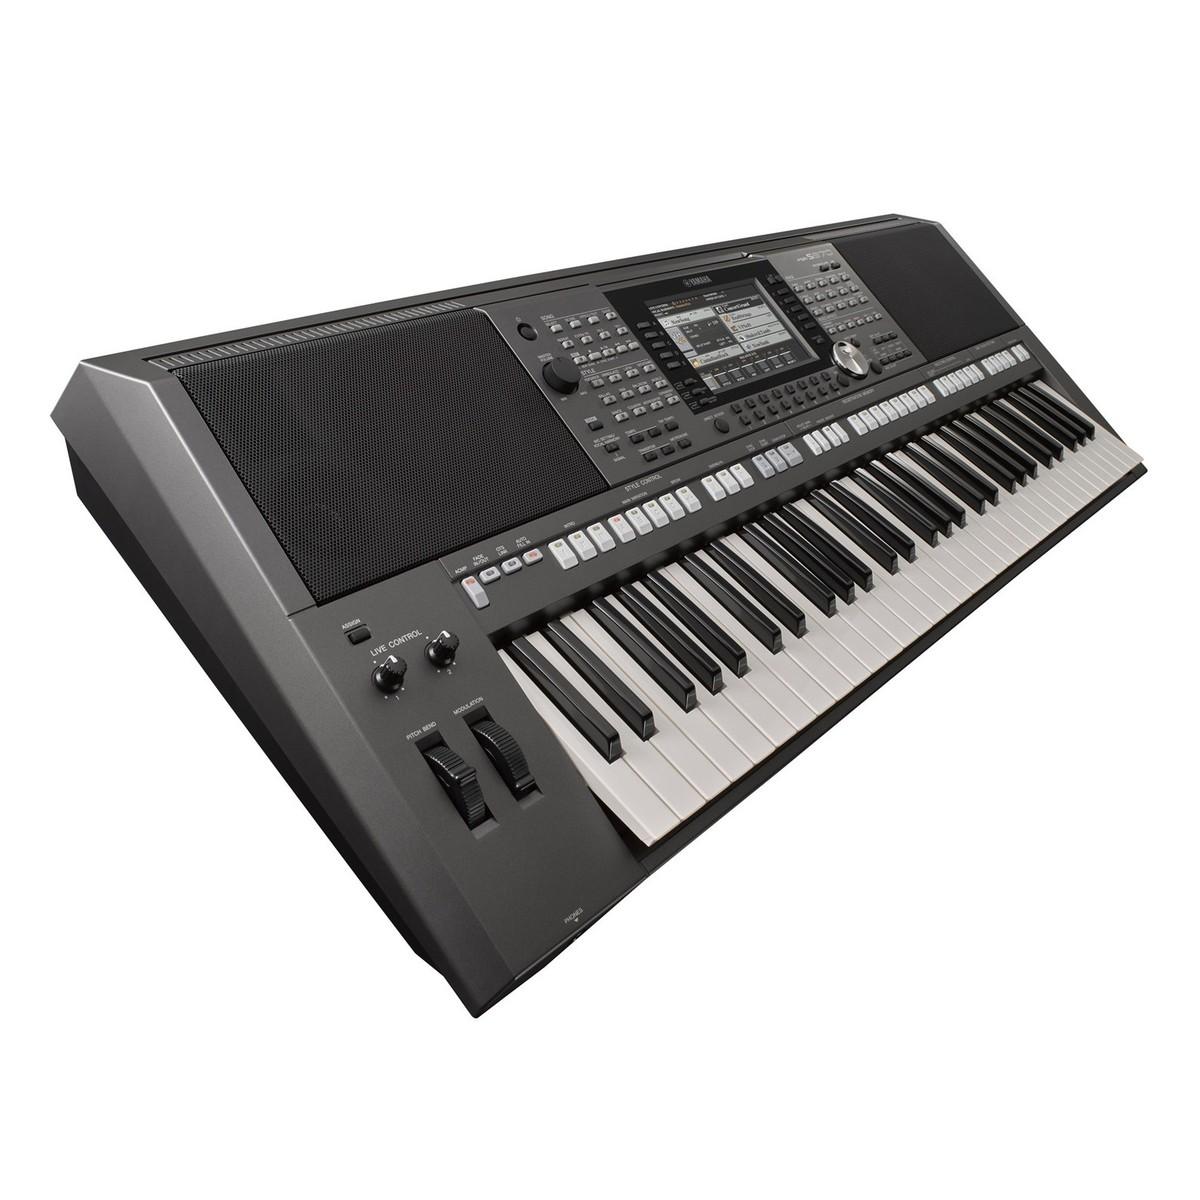 Yamaha psr s970 portable arranger workstation at for Yamaha psr s